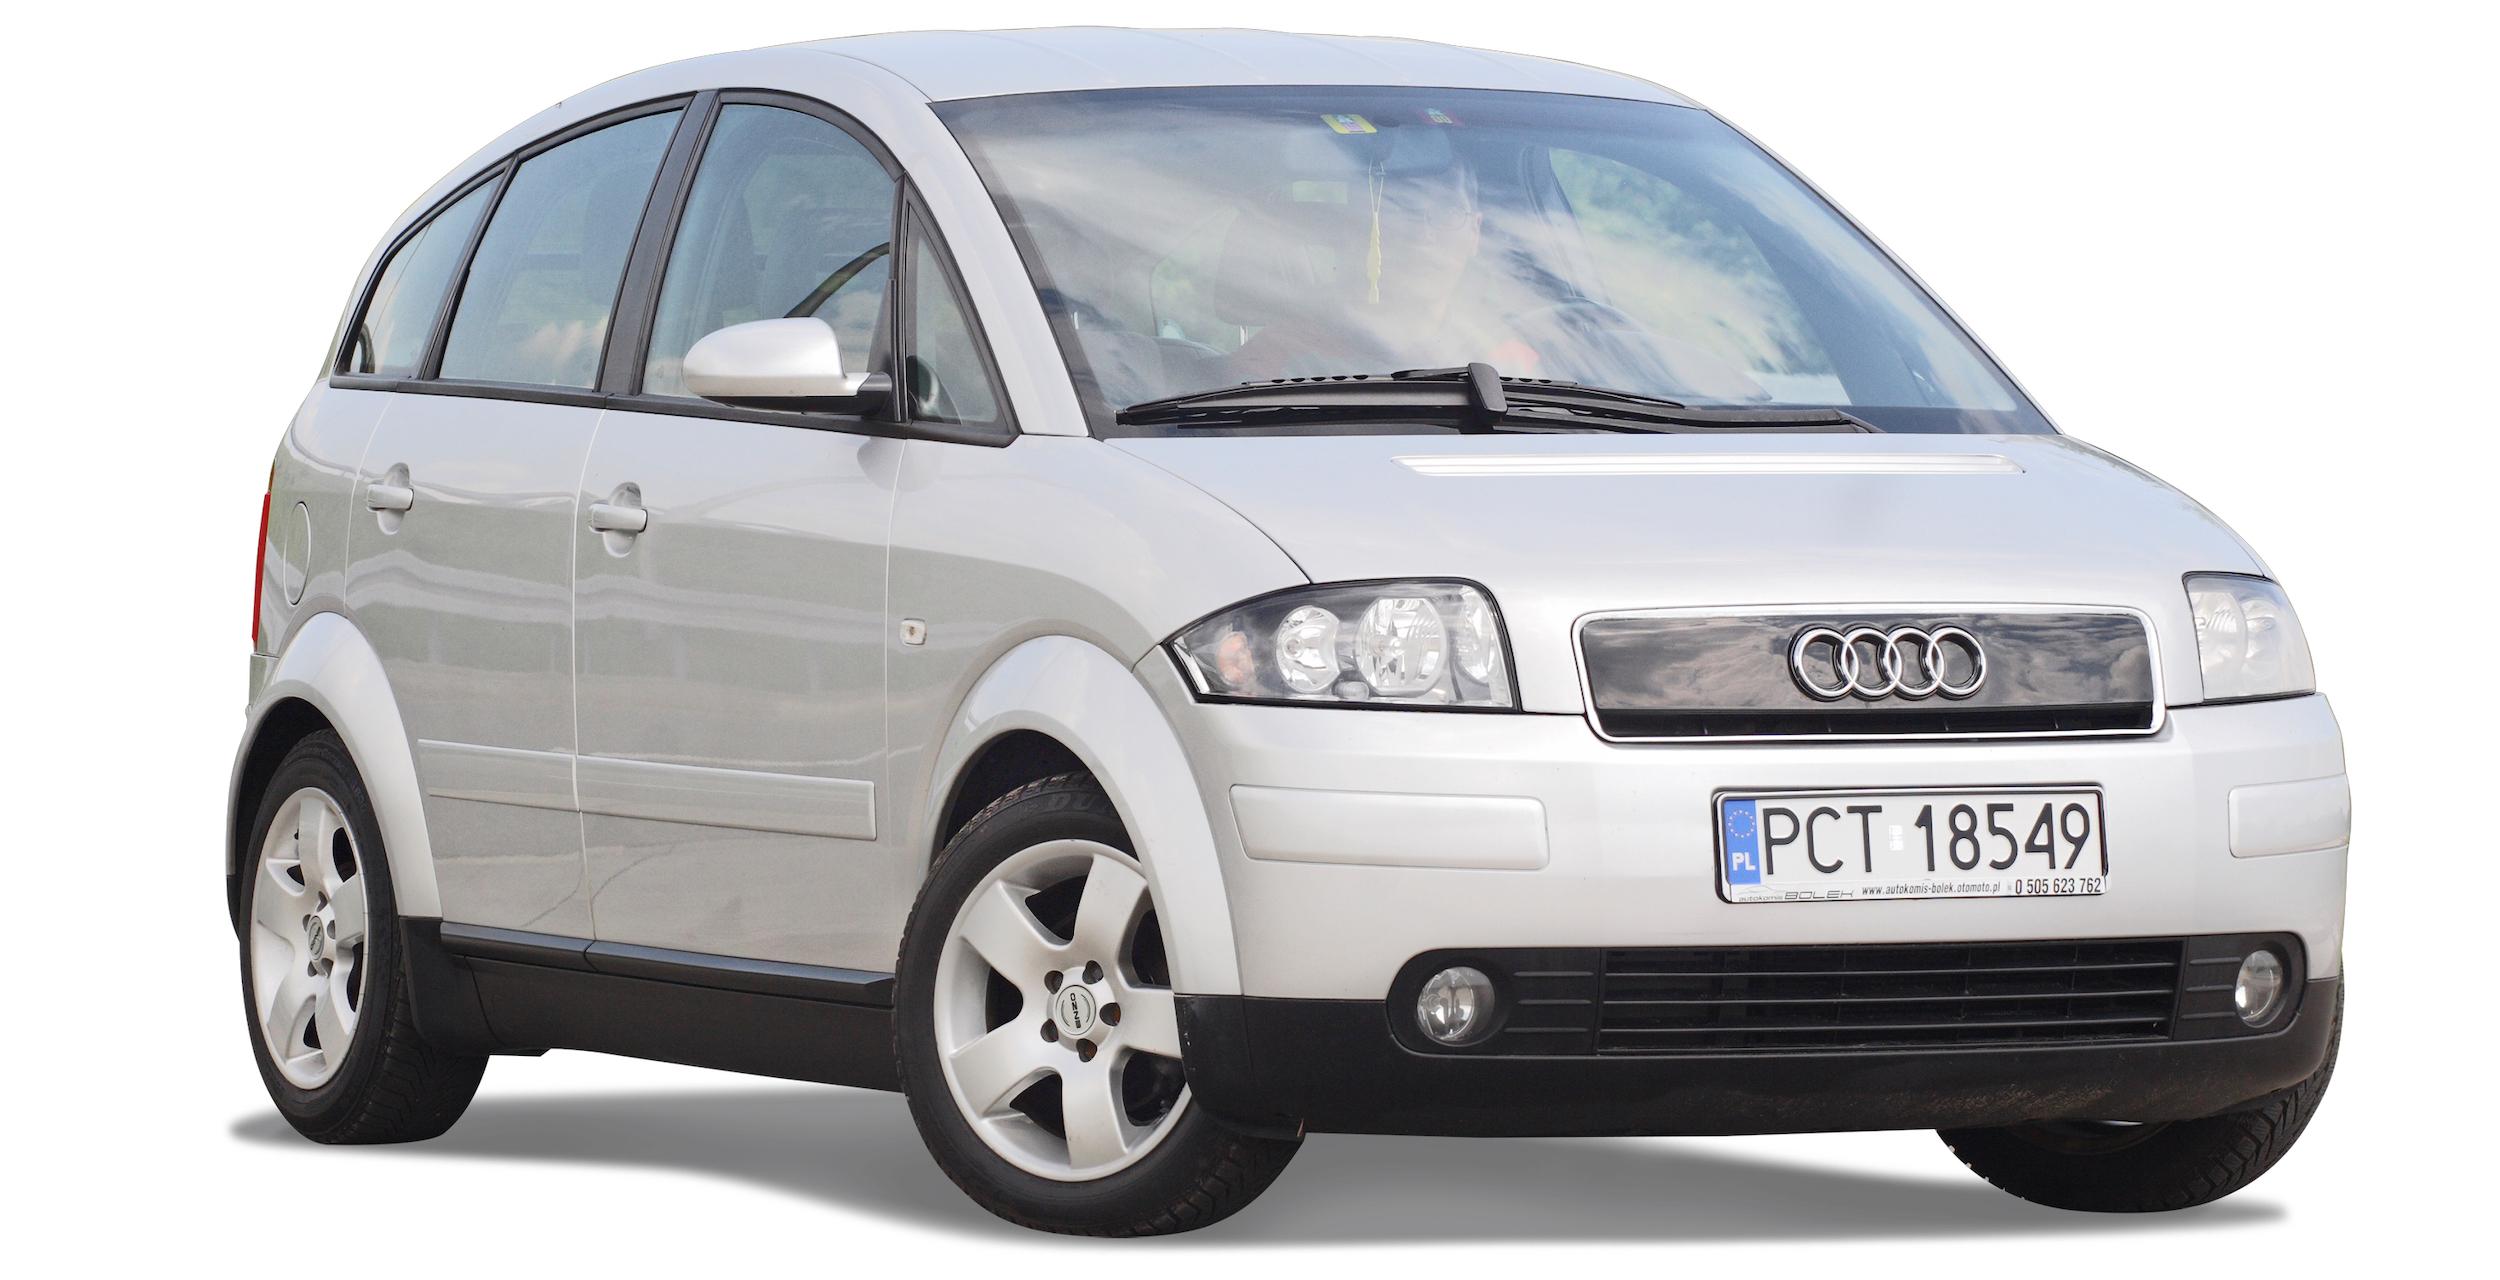 Audi A2 (1999-2005)